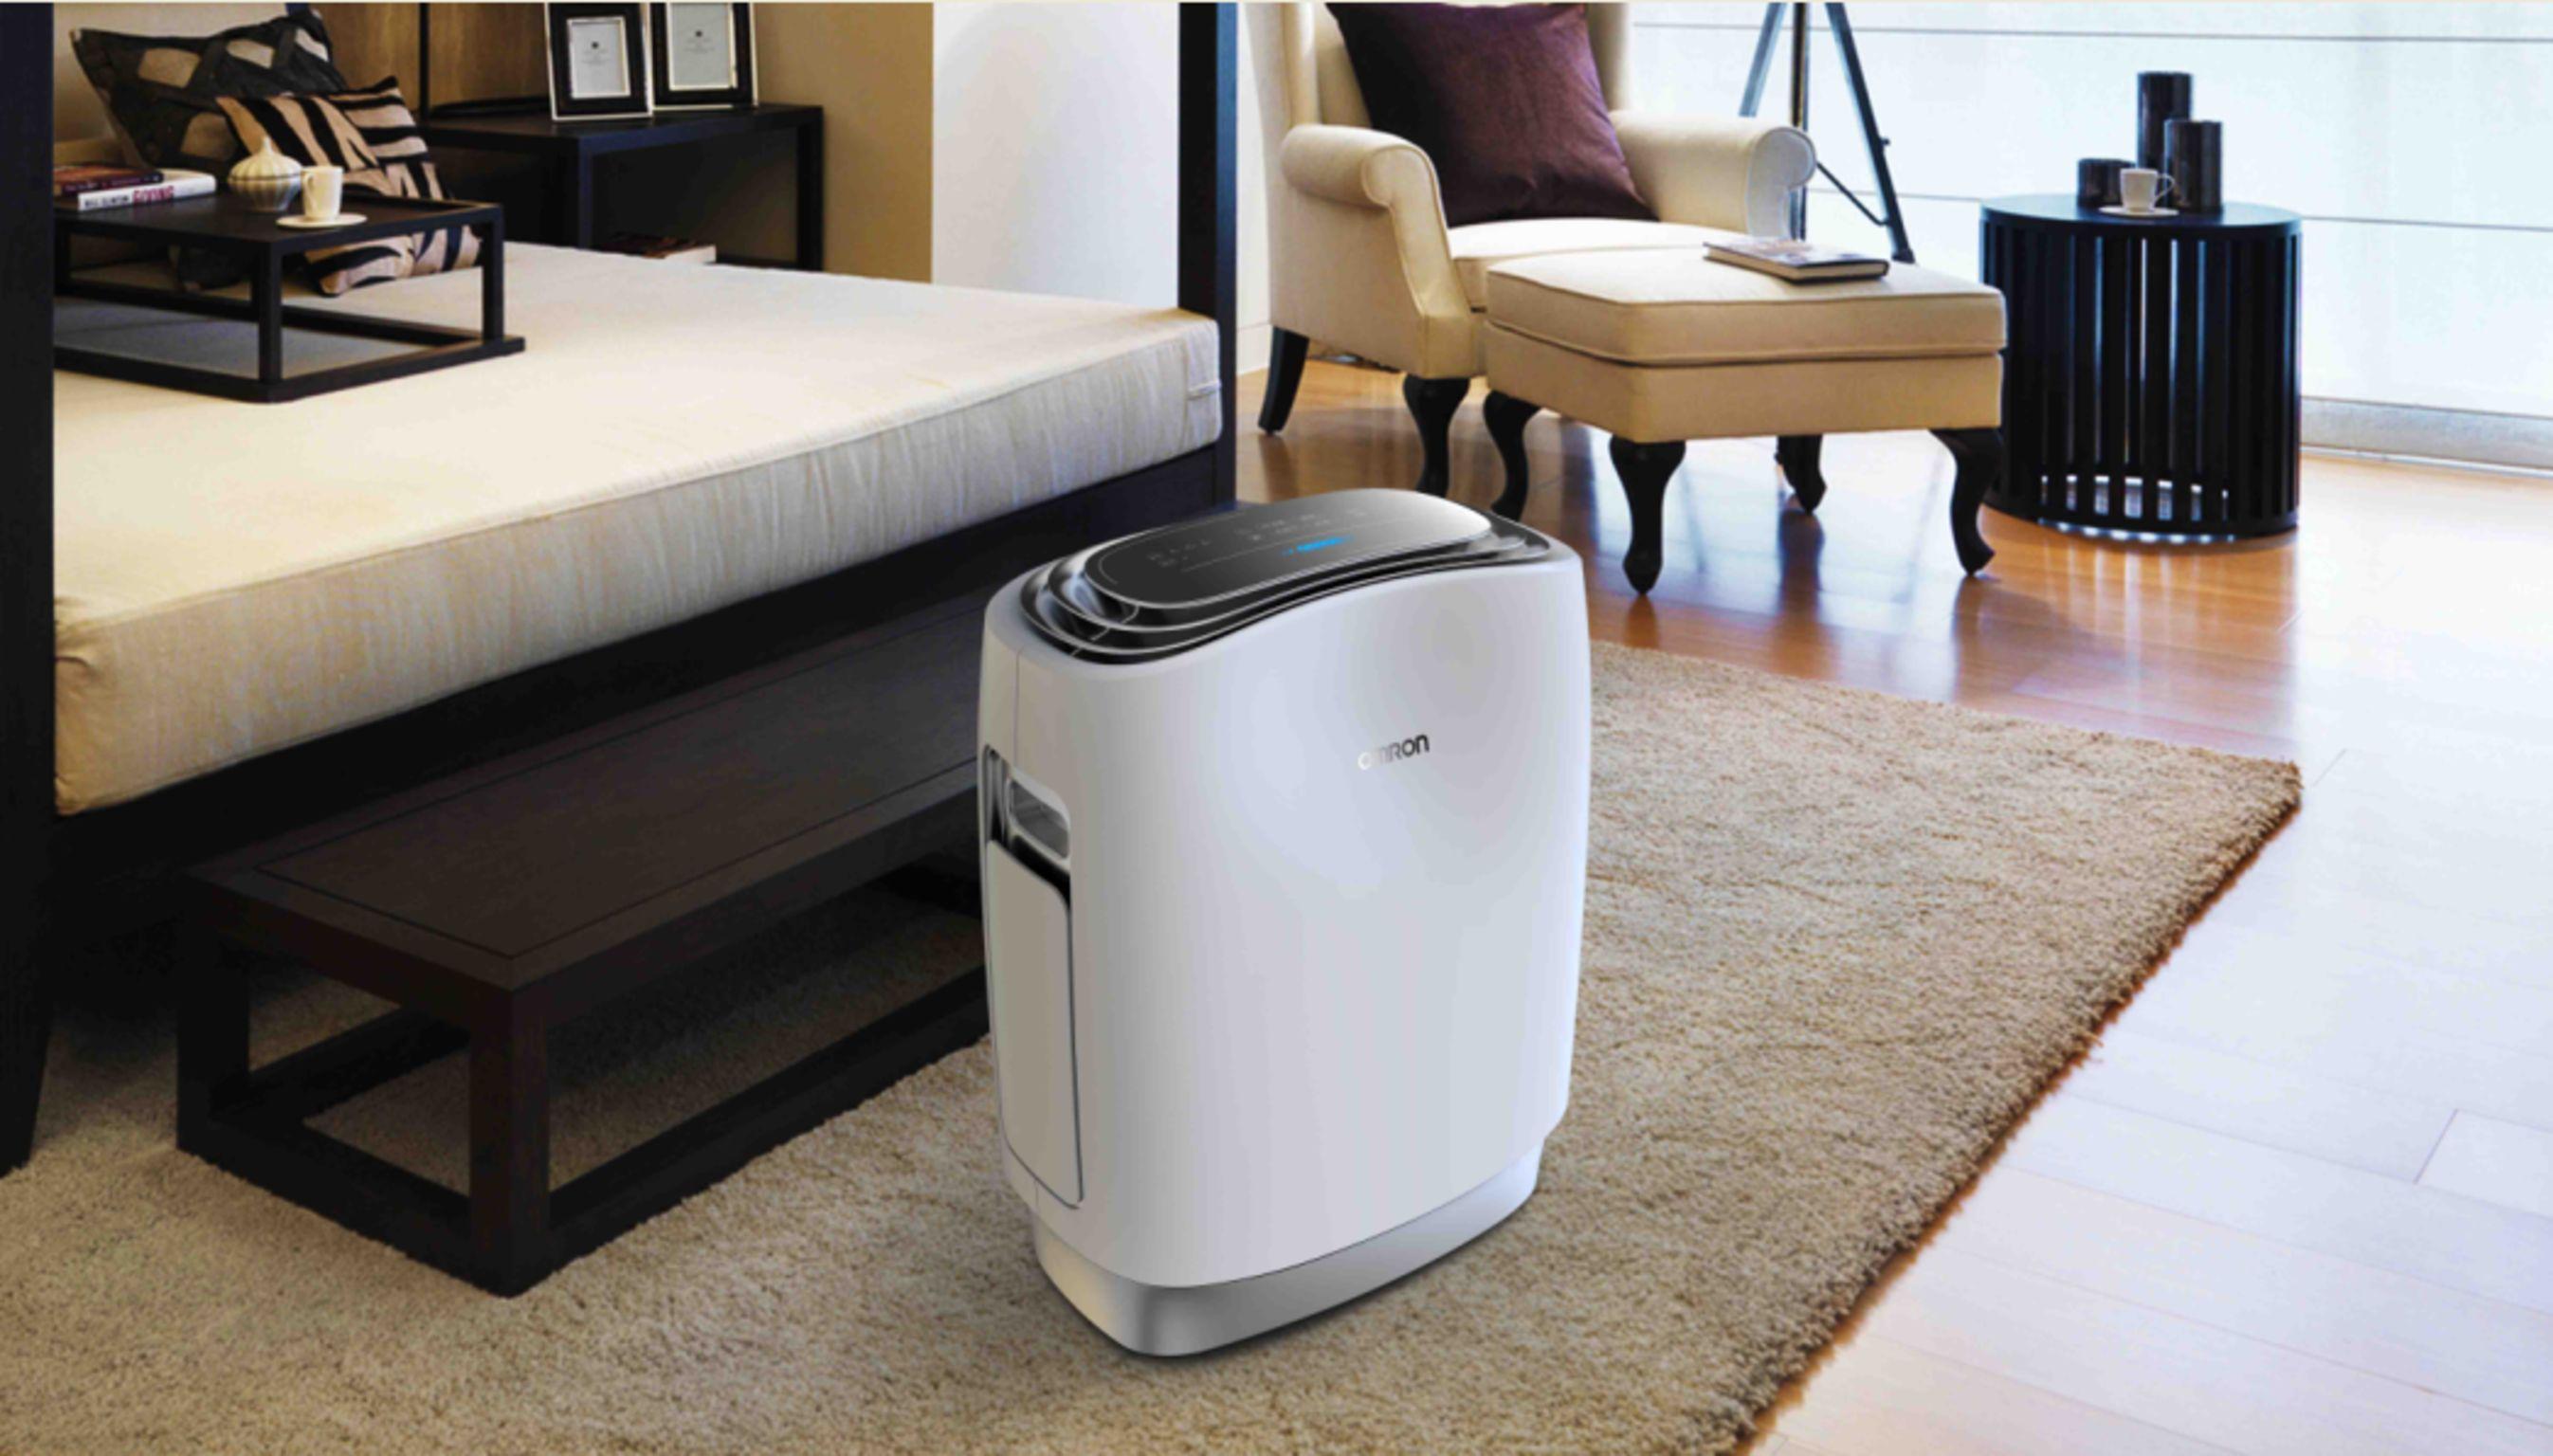 OMRON air purifier Air purifier Beitragsdetails iF